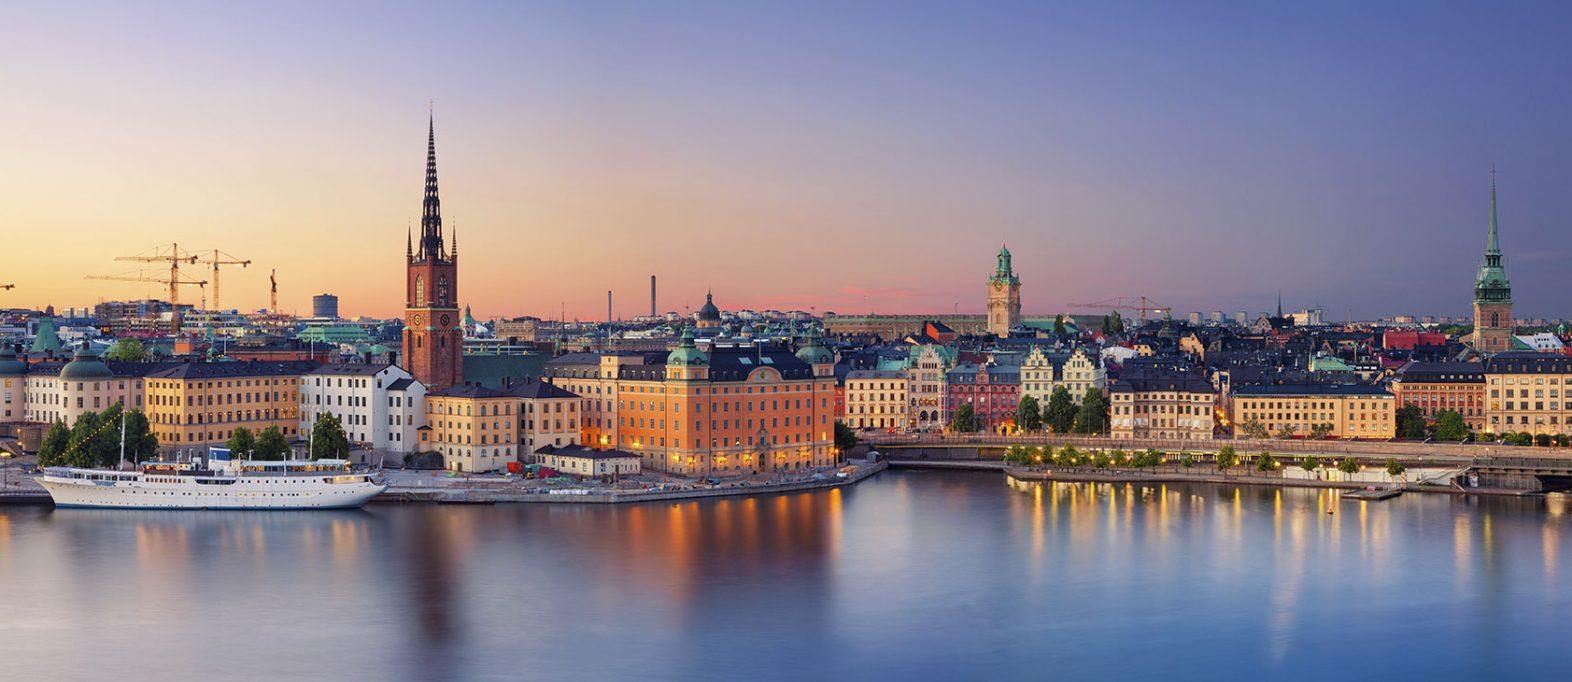 Skyline Stockholm Adobe Stock, ID: 116337570